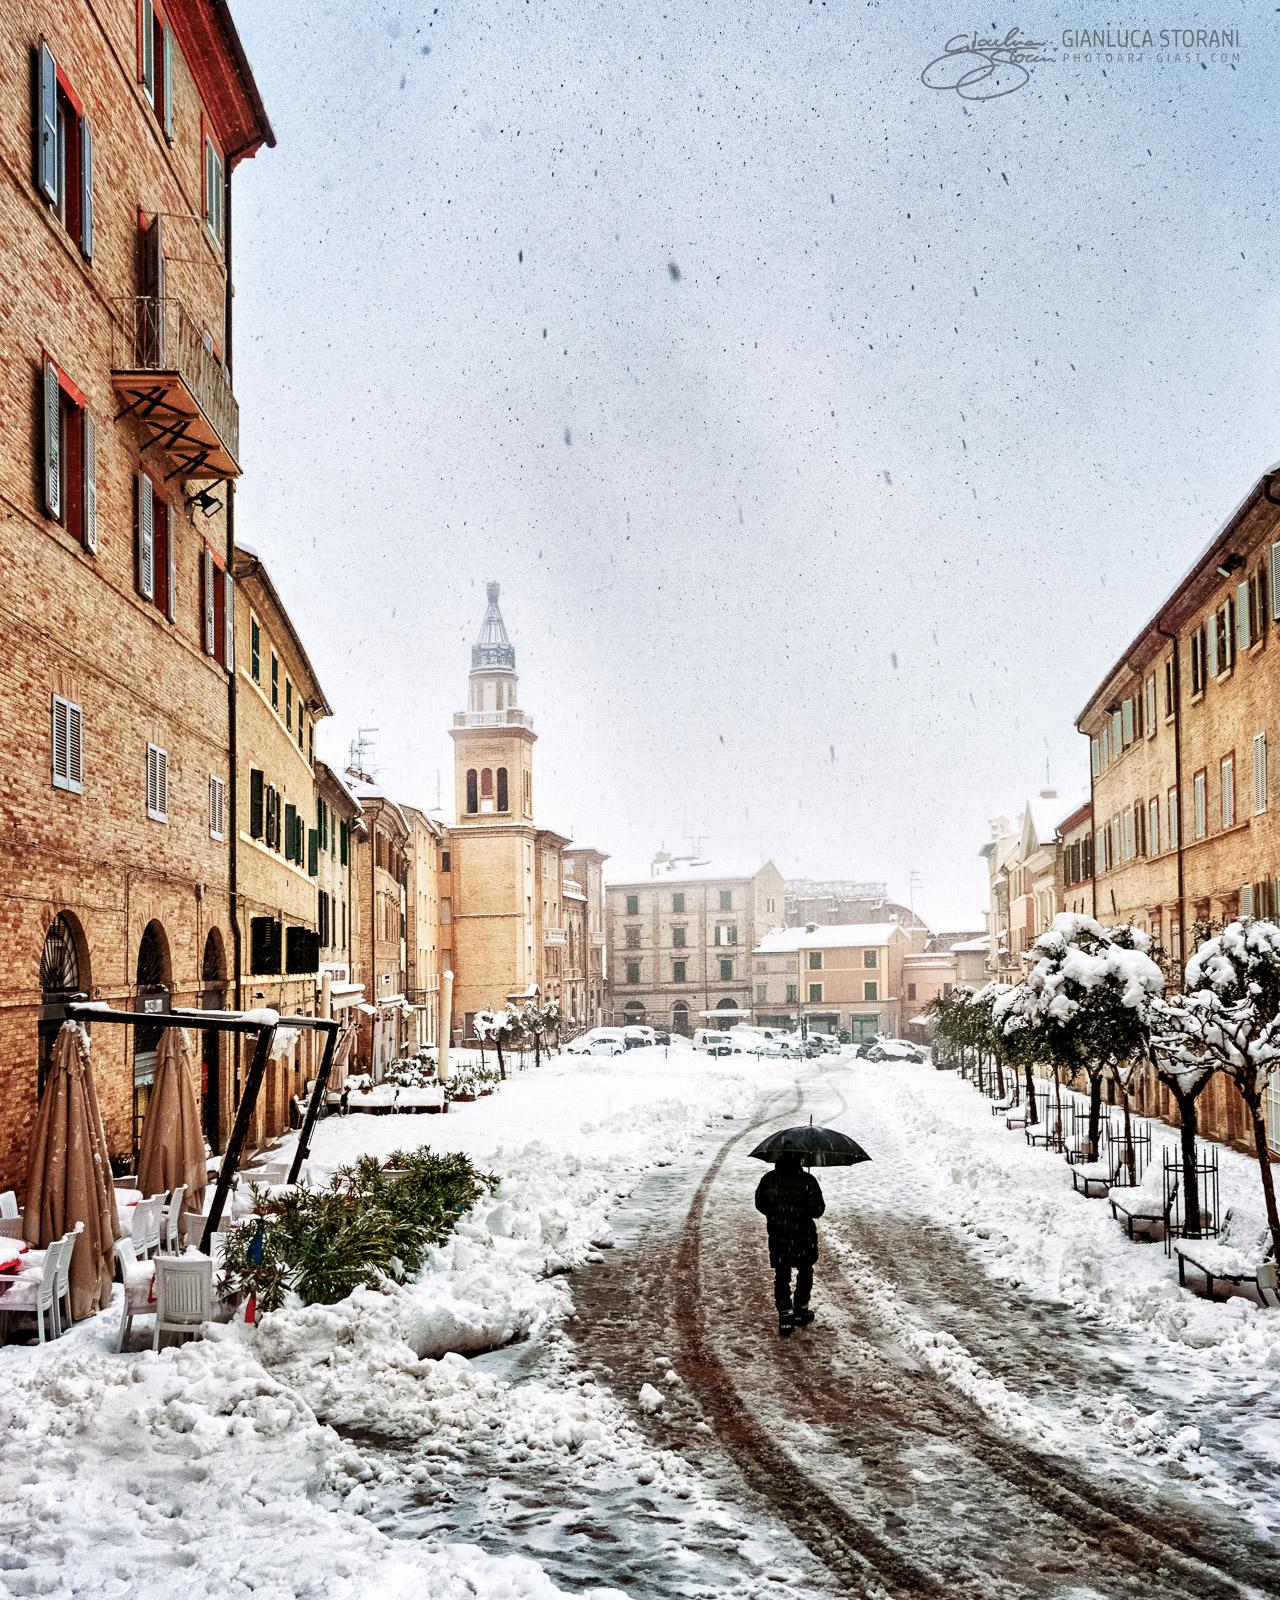 Neve in Piazza Mazzini - Gianluca Storani Photo Art (ID: 3-3946)